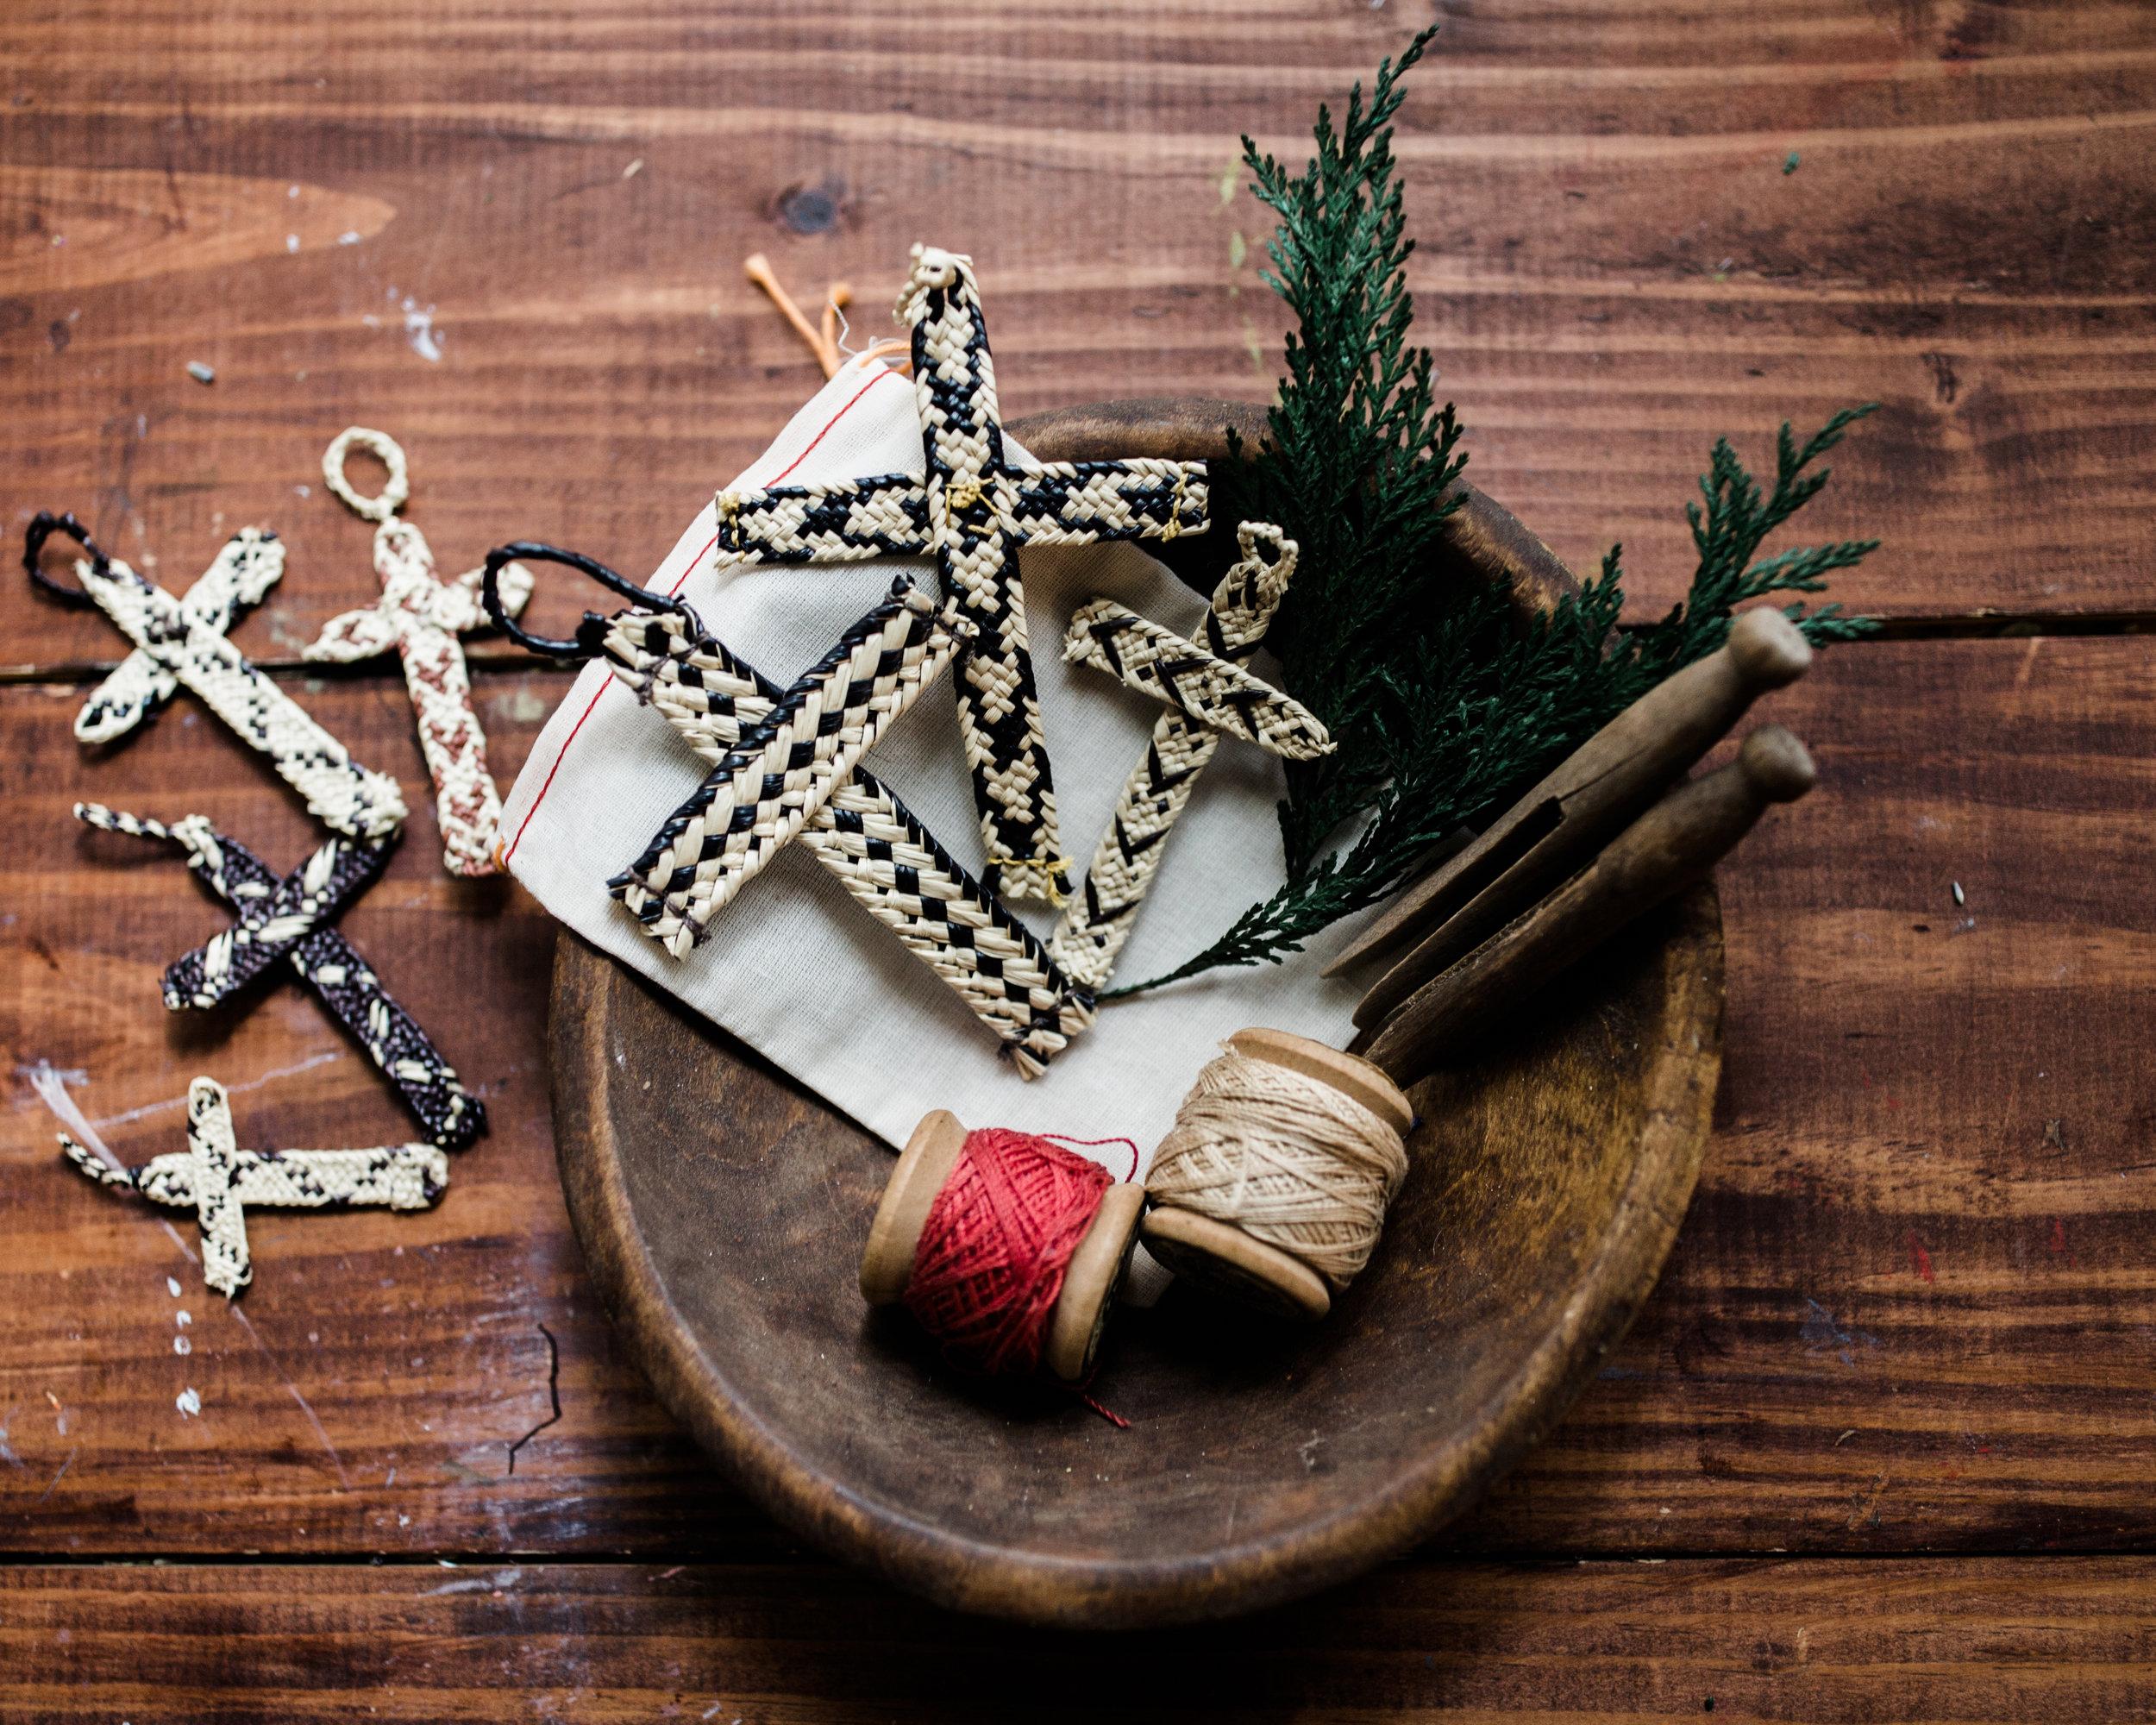 hands-producing-hope-costa-rica-christmas-crosses-0075.jpg